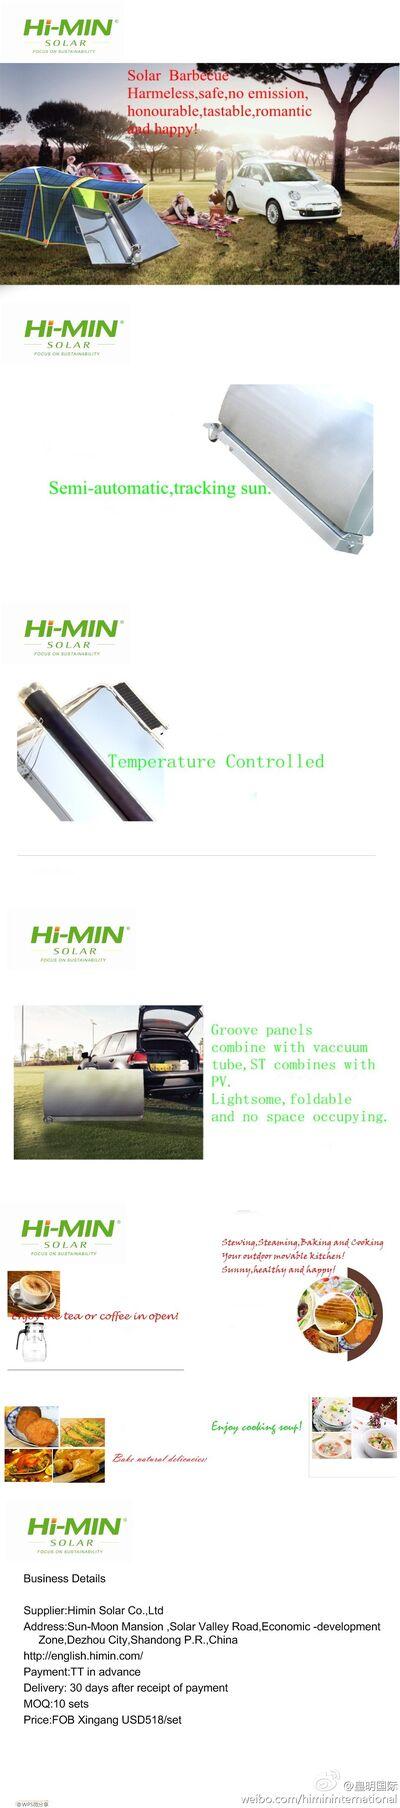 Himin solar barbecue